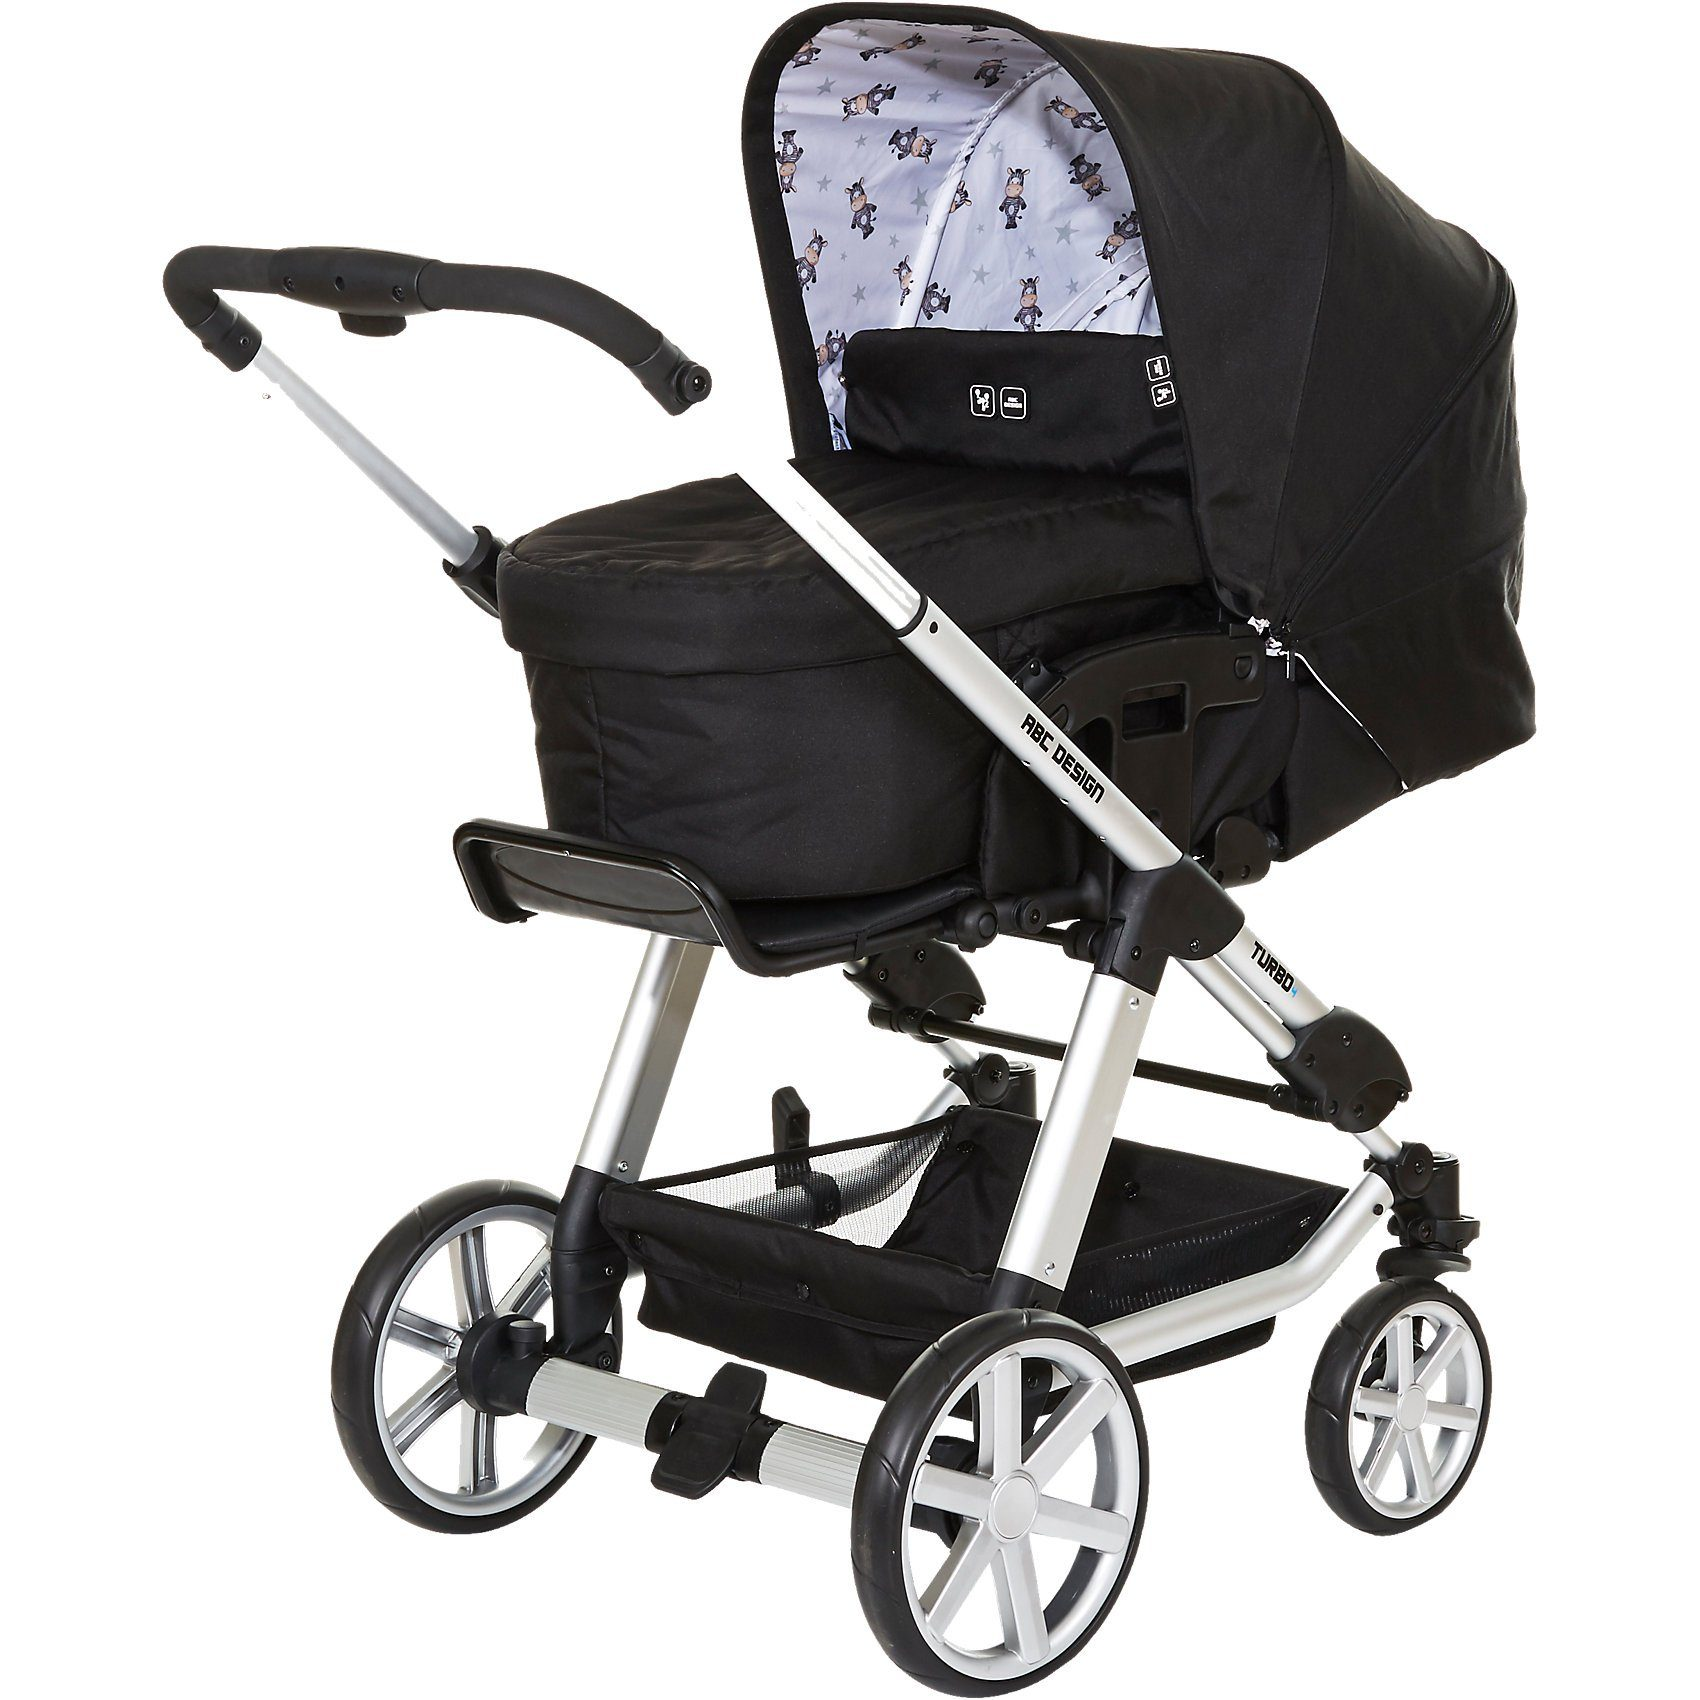 ABC Design Kombi Kinderwagen Turbo 4, zebra, 2017